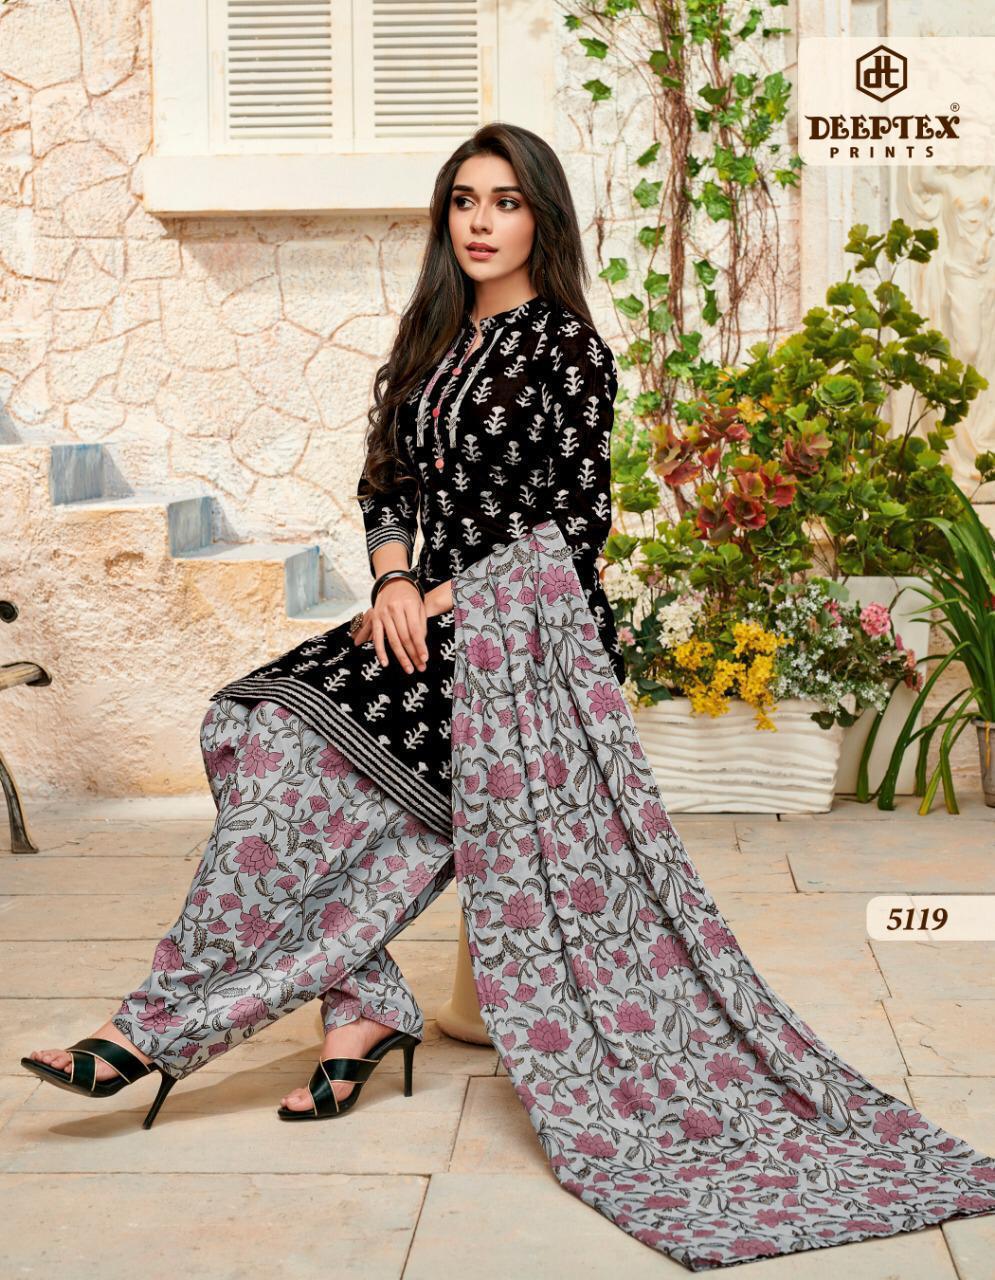 Deeptex Miss India Vol 51 Designer Cotton Daily Wear Suits Wholesale